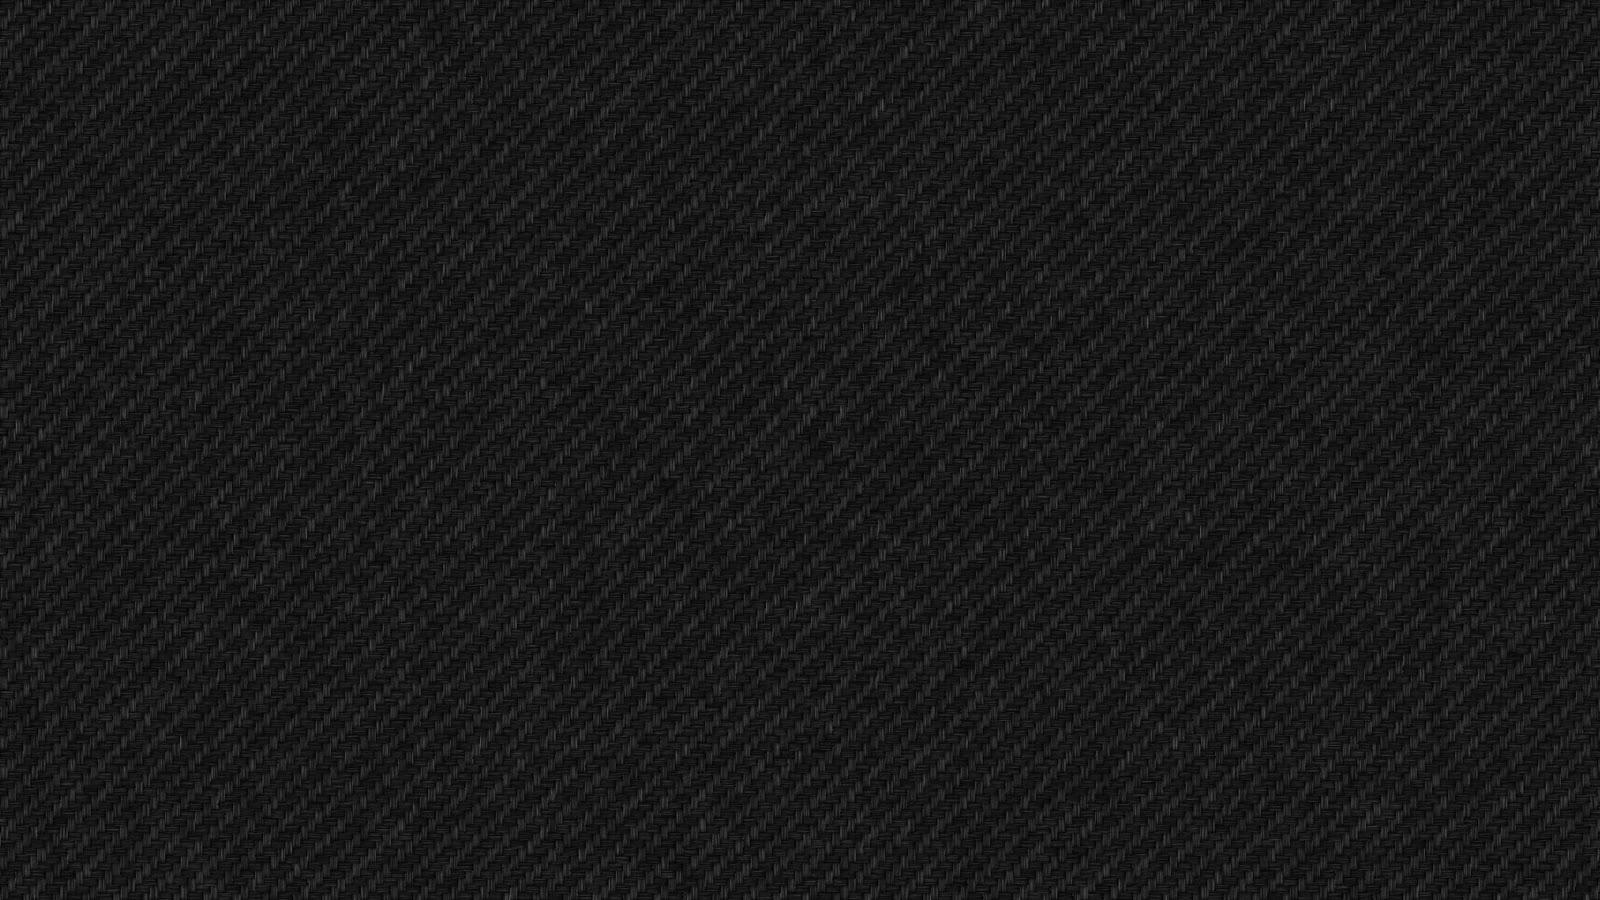 Hd Black Background 30 Desktop Wallpaper